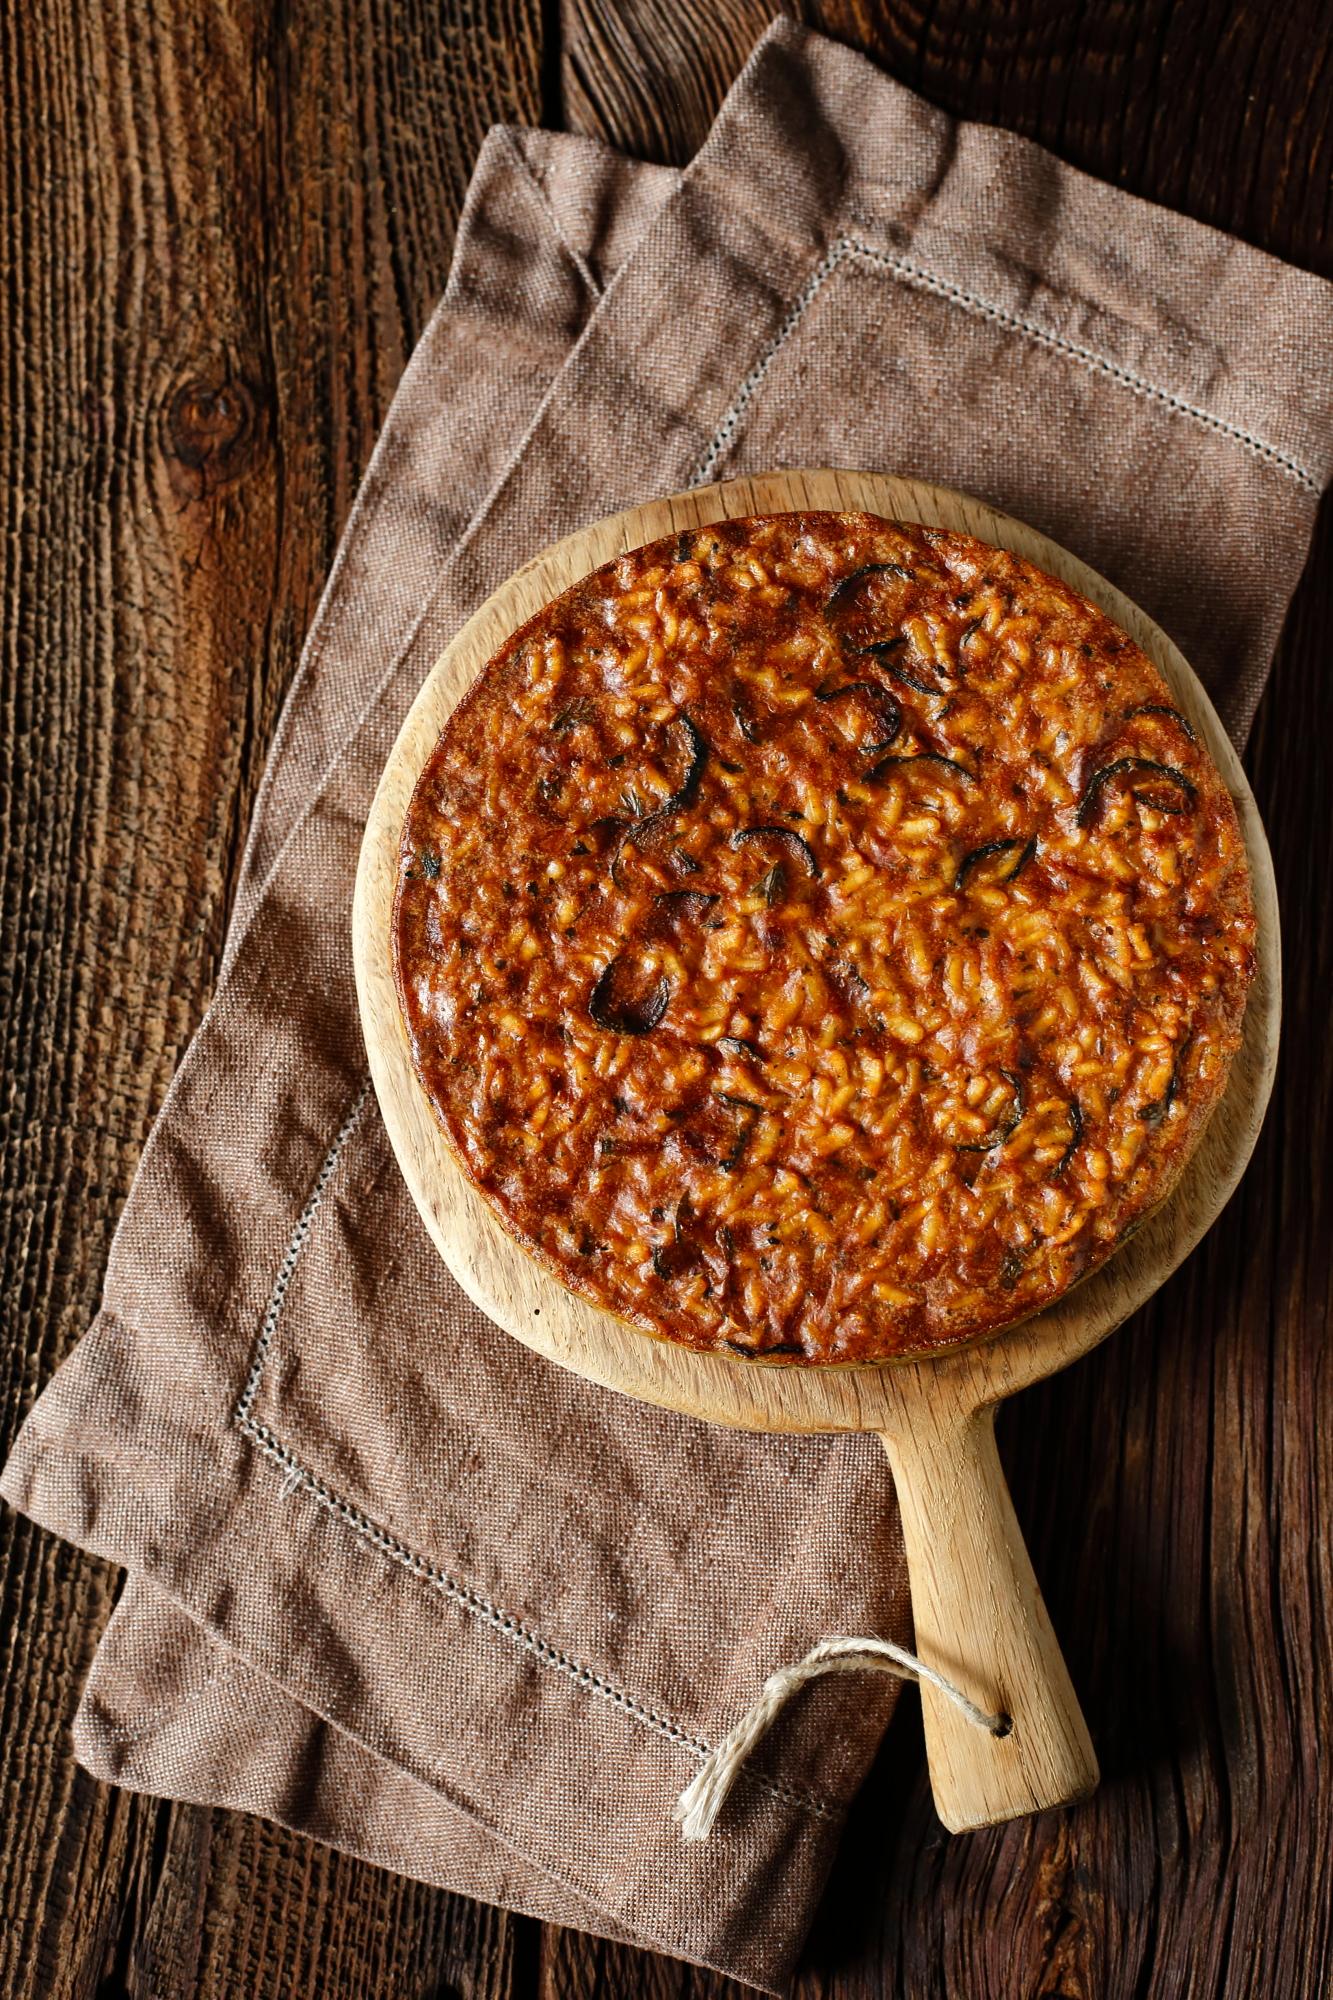 Torta di riso e zucchine - ciasto z ryżu i cukinii